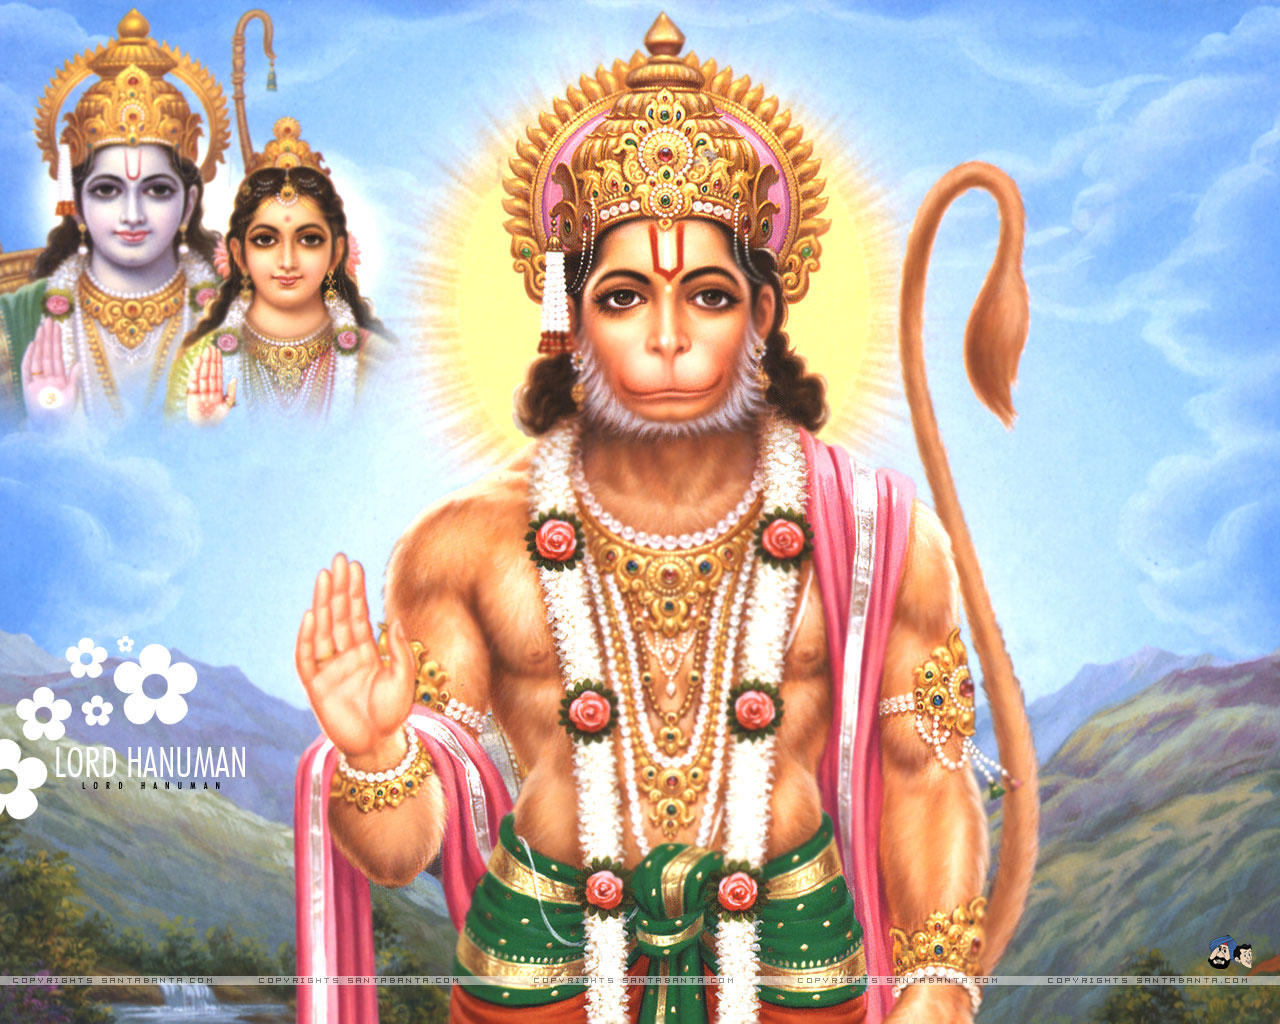 Hindu Gods HD Wallpapers 1280x1024